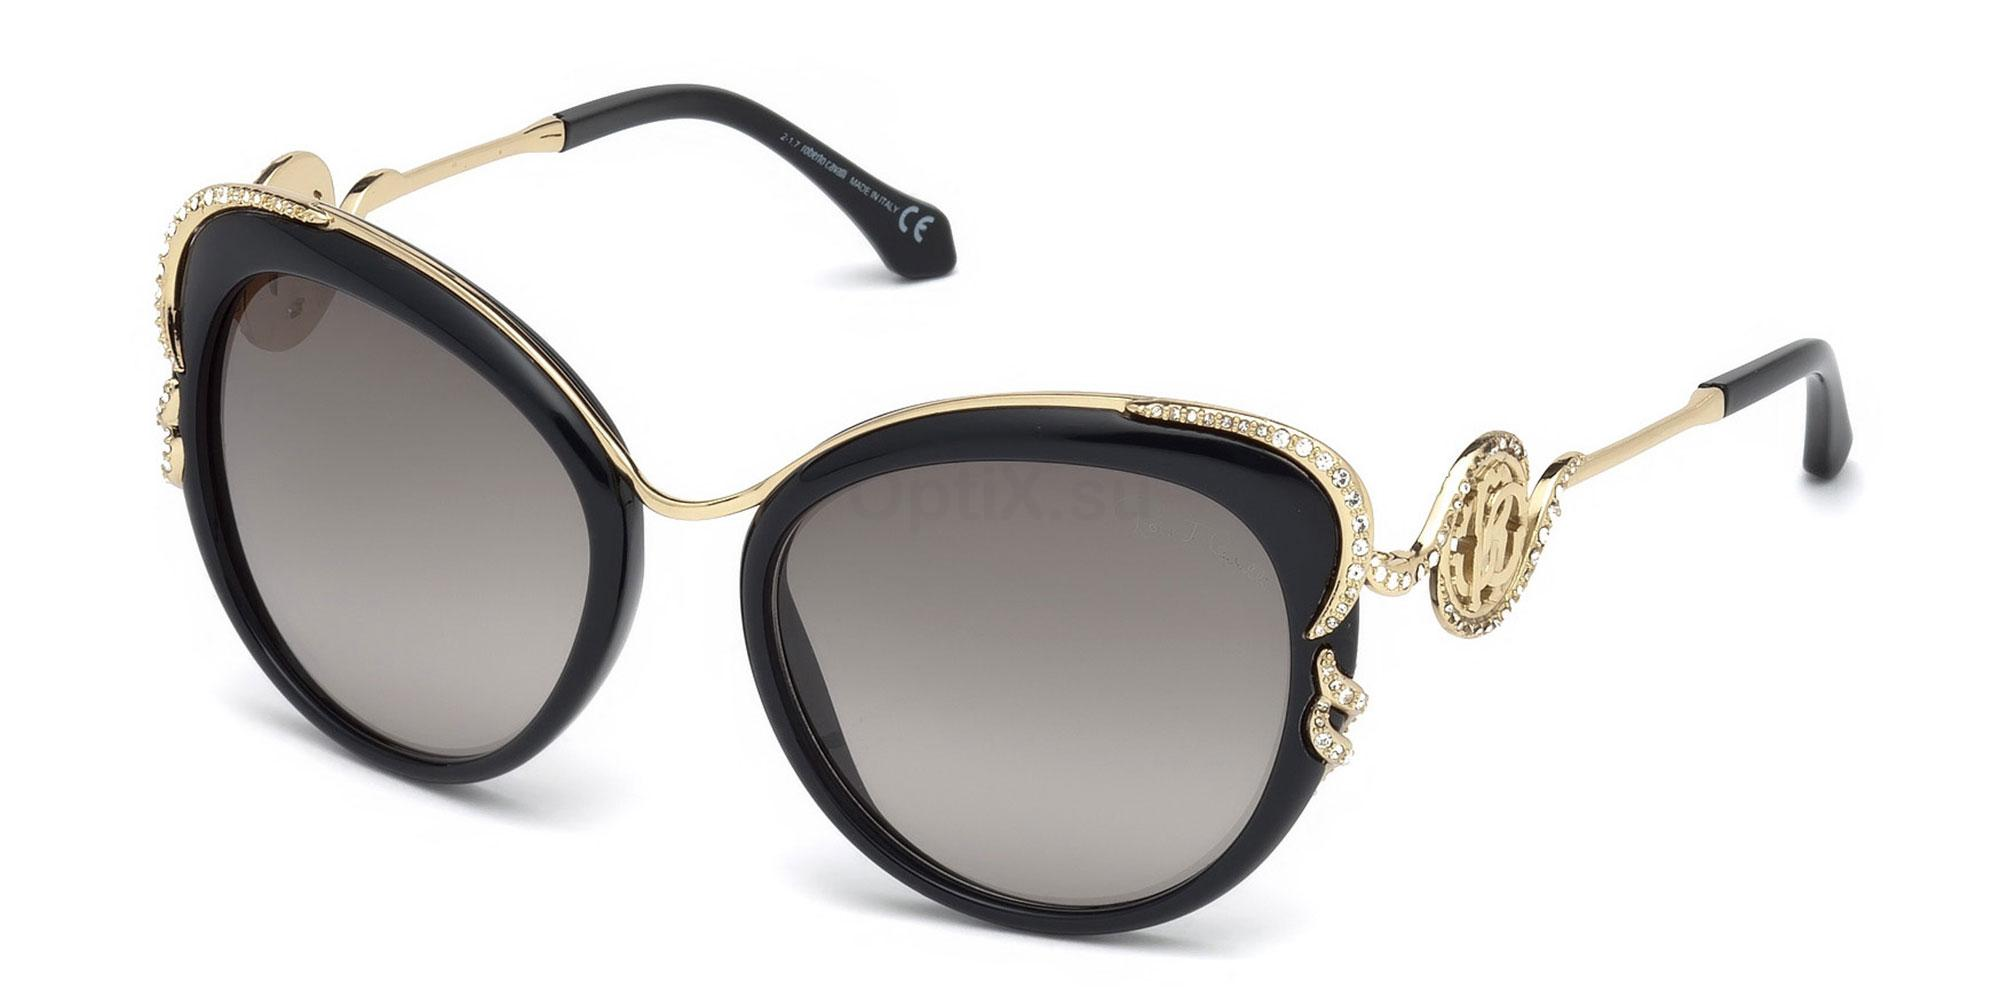 01B RC1073 Sunglasses, Roberto Cavalli